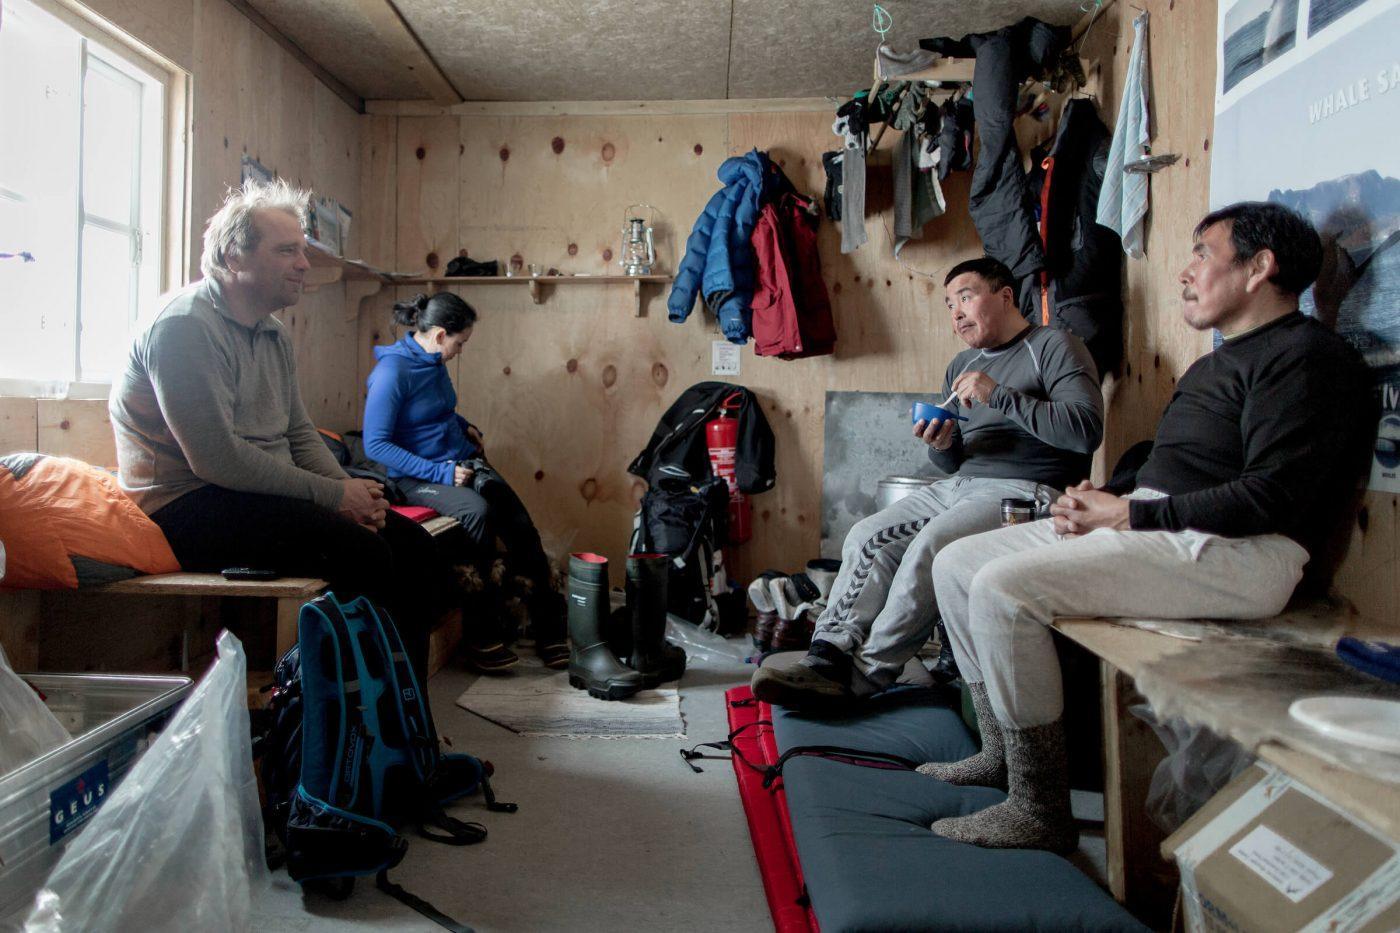 Dog mushers in the Travellodge Greenland hut near Sermilik in East Greenland. By Mads Pihl